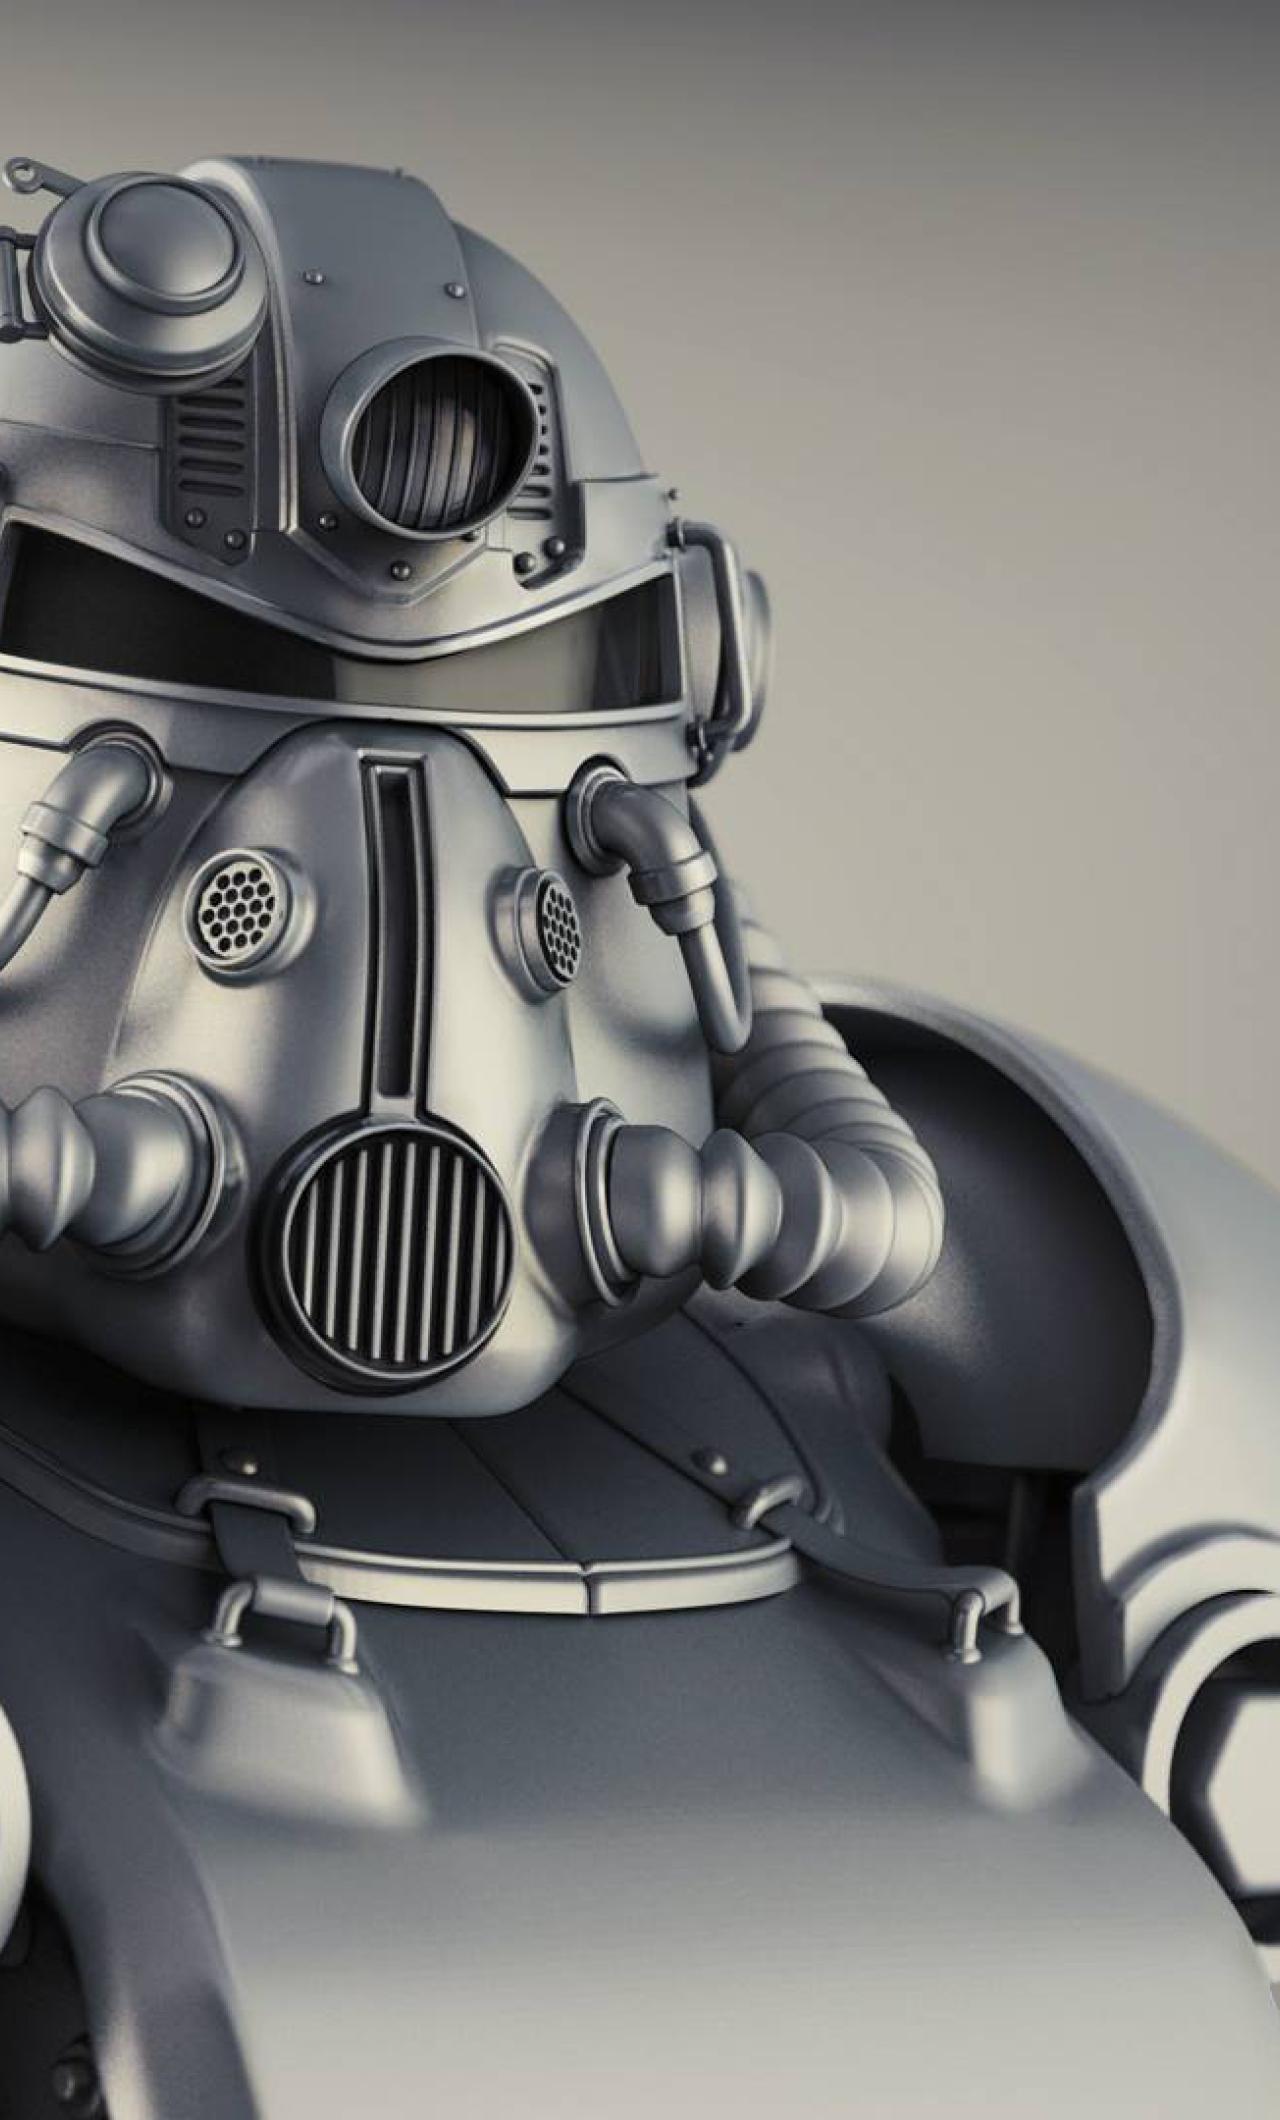 1280x2120 Fallout 4 T 51b Power Armor Iphone 6 Plus Wallpaper